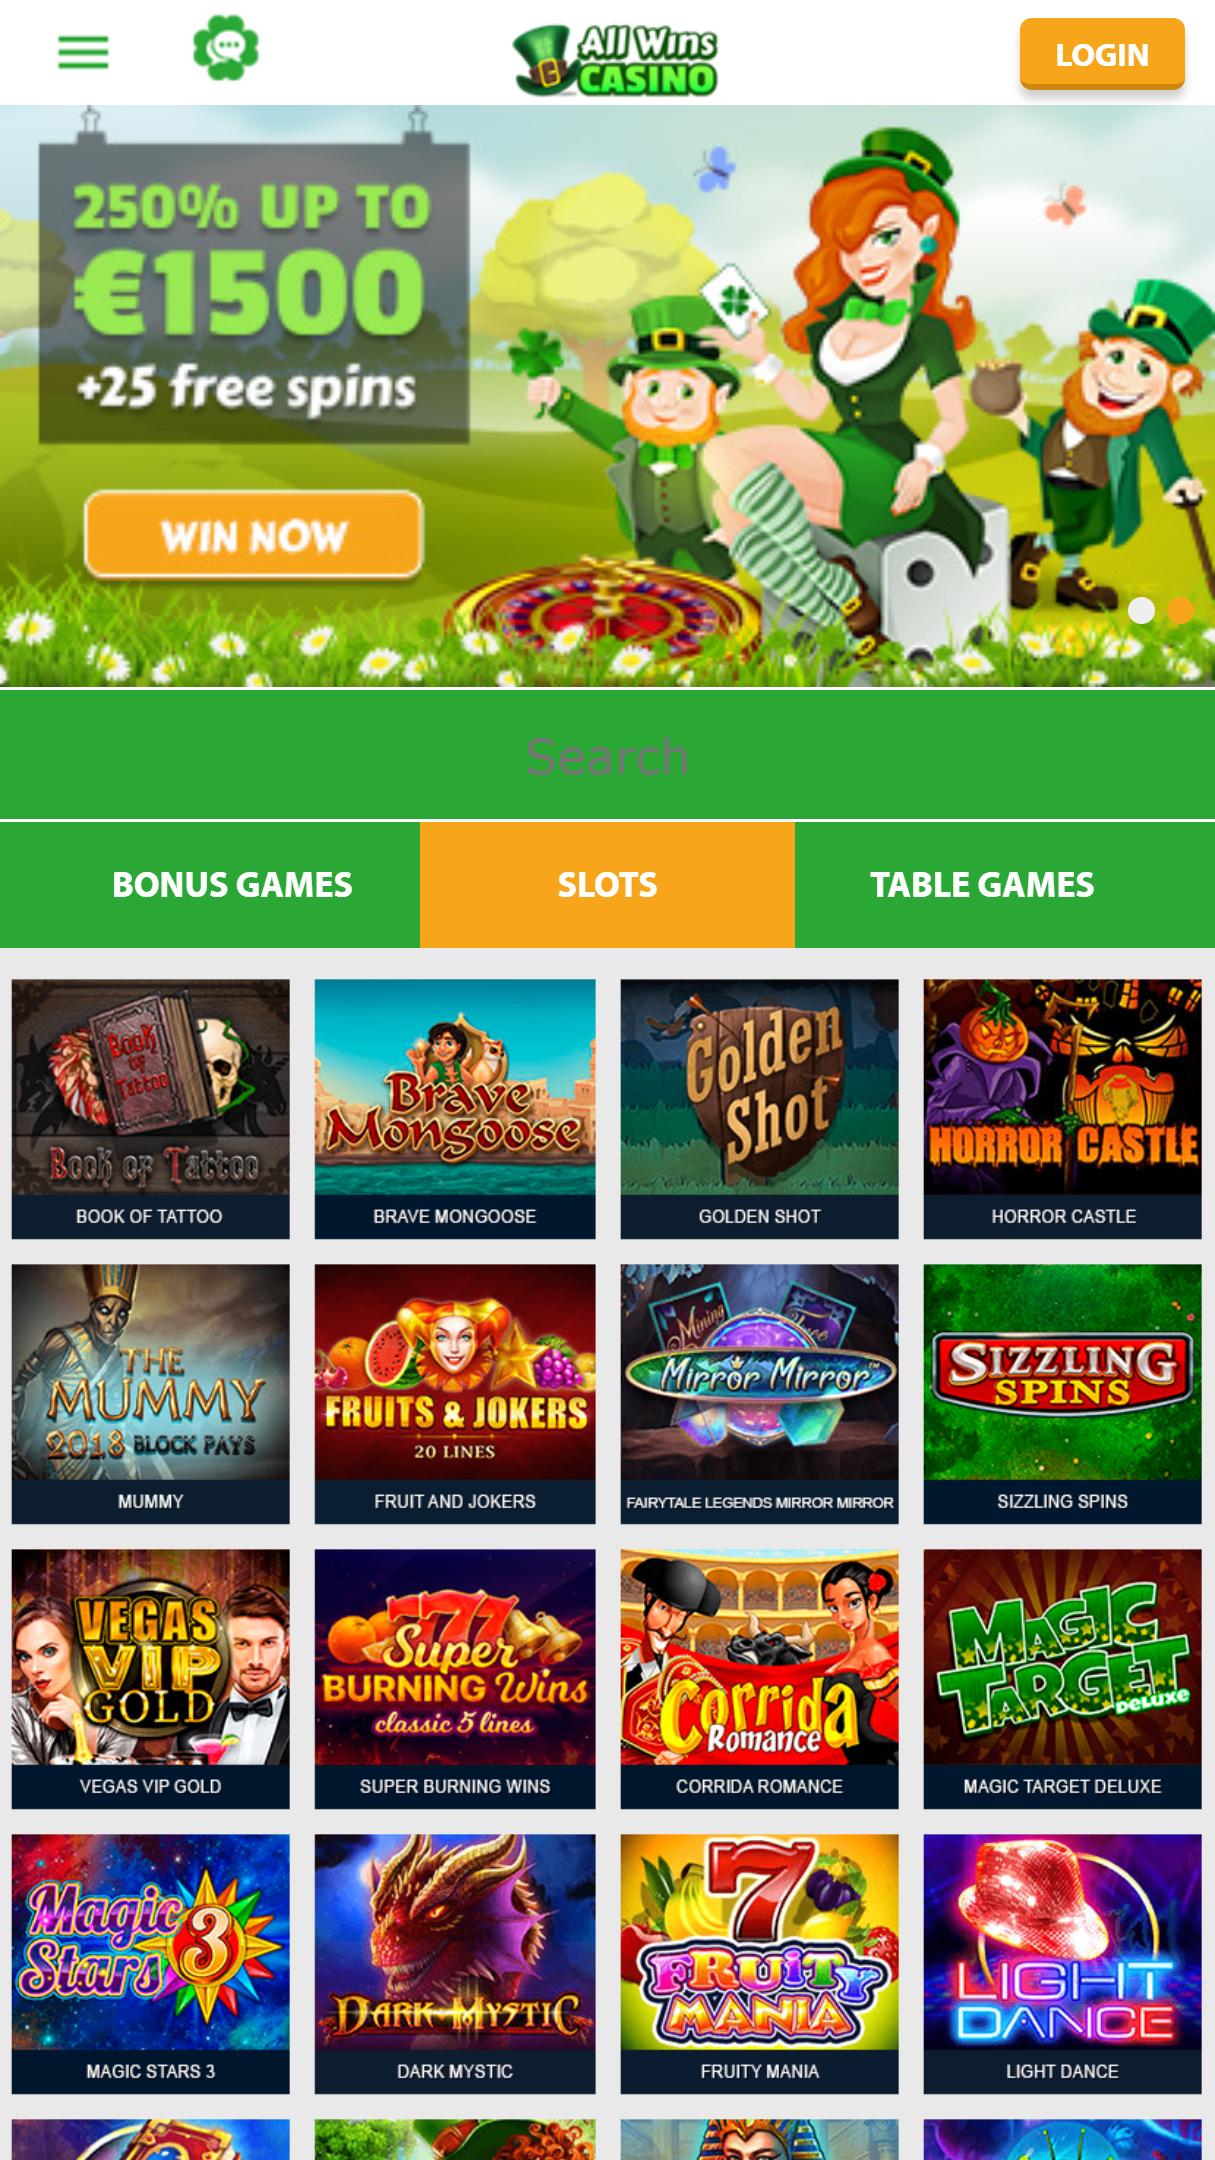 All Wins Casino App Homepage